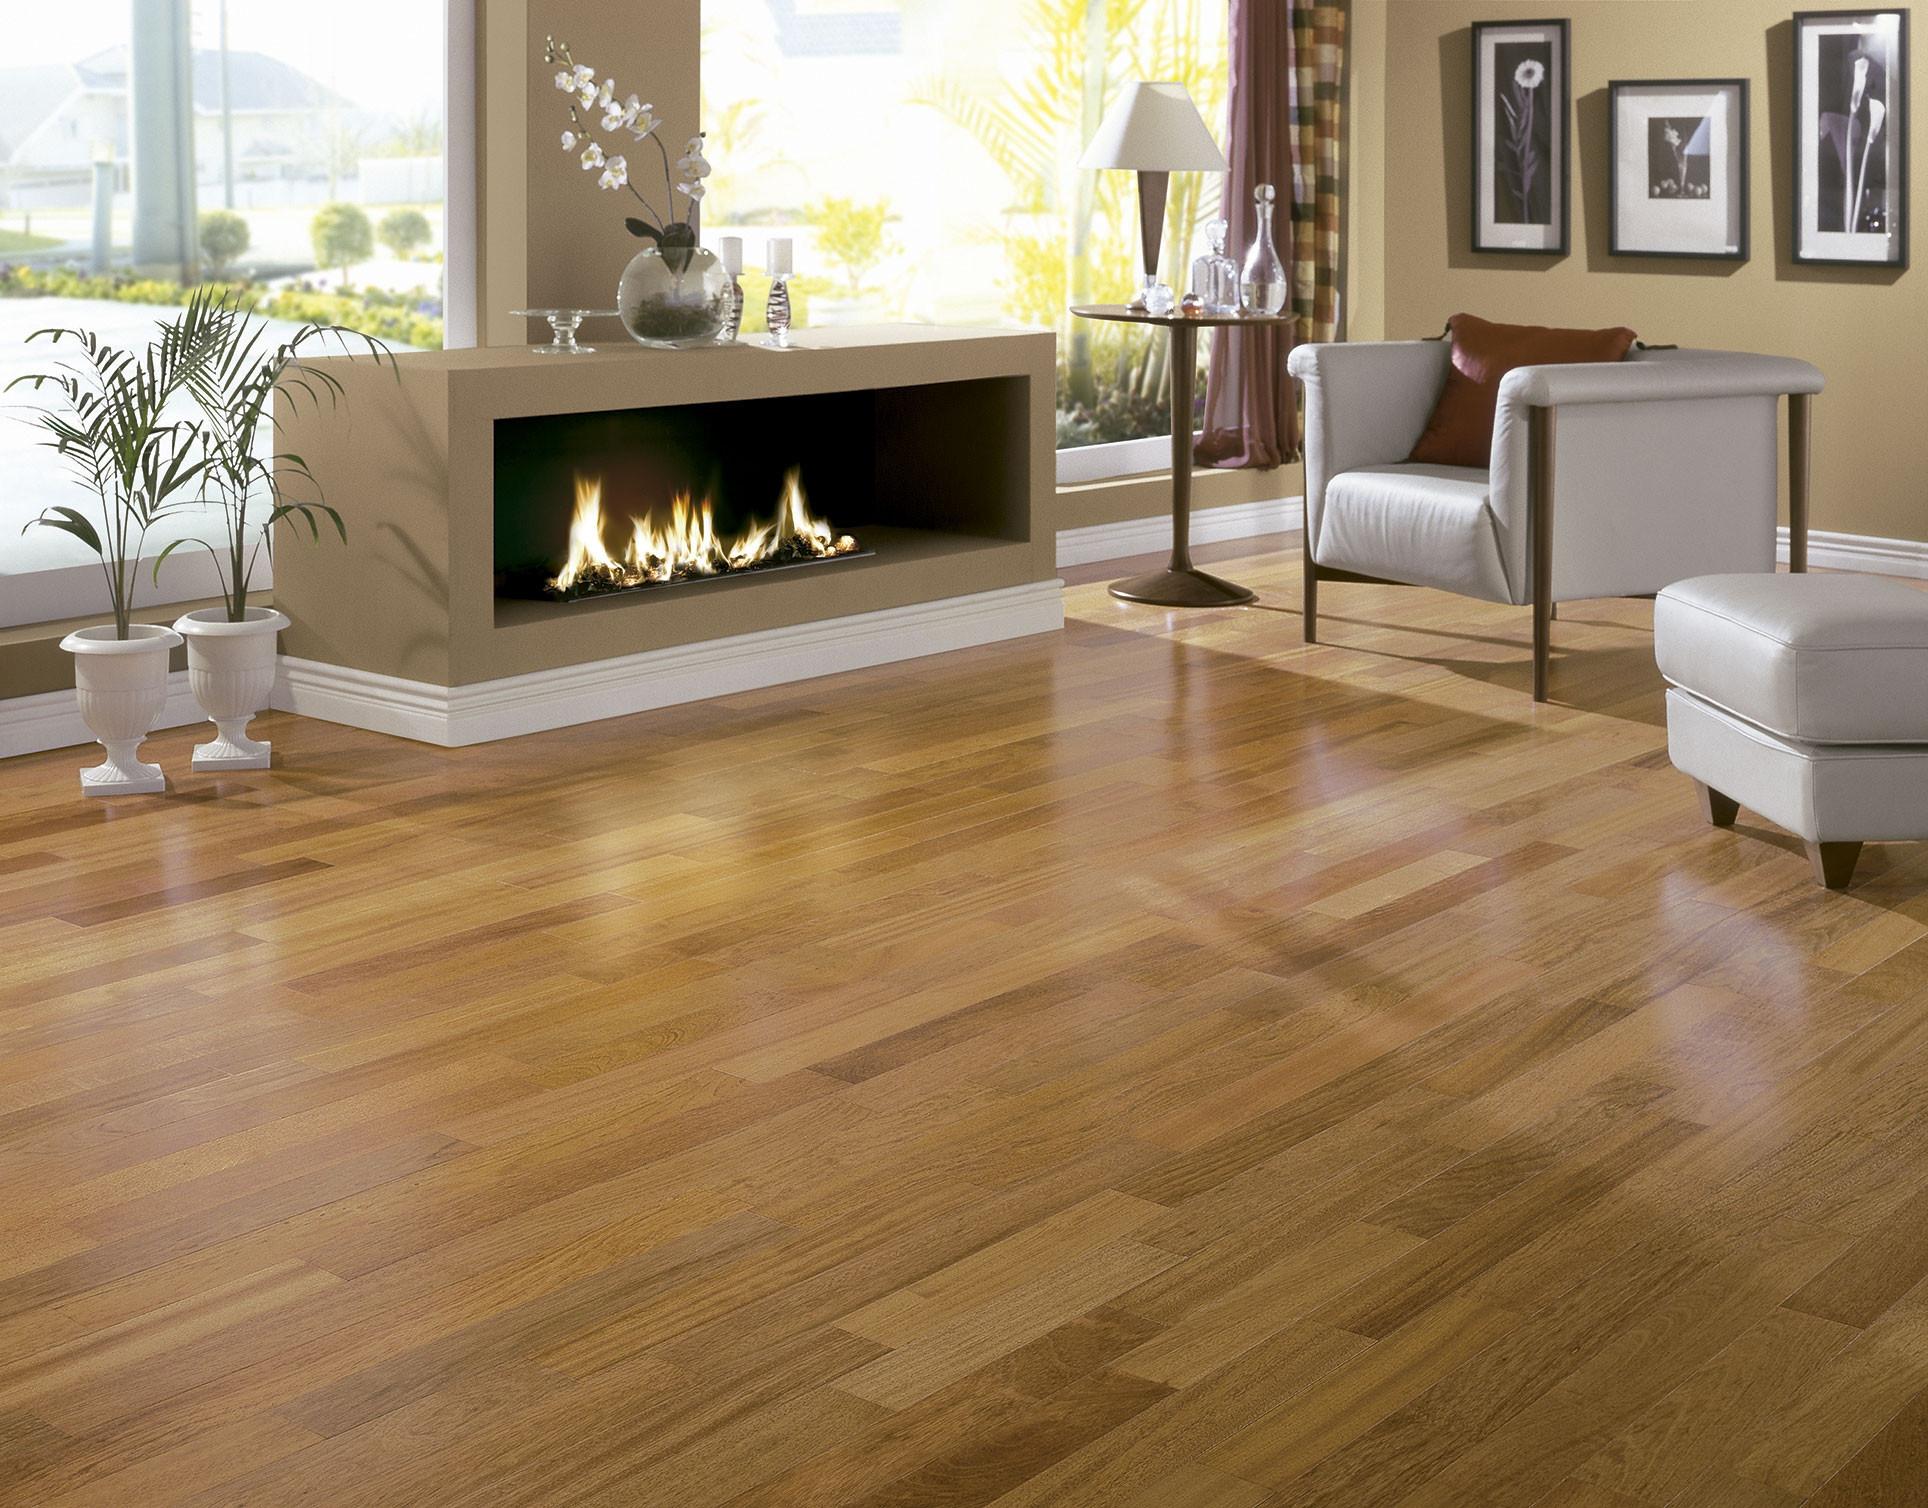 engineered hardwood flooring vs hardwood flooring of fresh laminate or engineered wood flooring for kitchen with hand scraped engineered wood flooring fresh engaging discount hardwood flooring 5 where to buy inspirational 0d